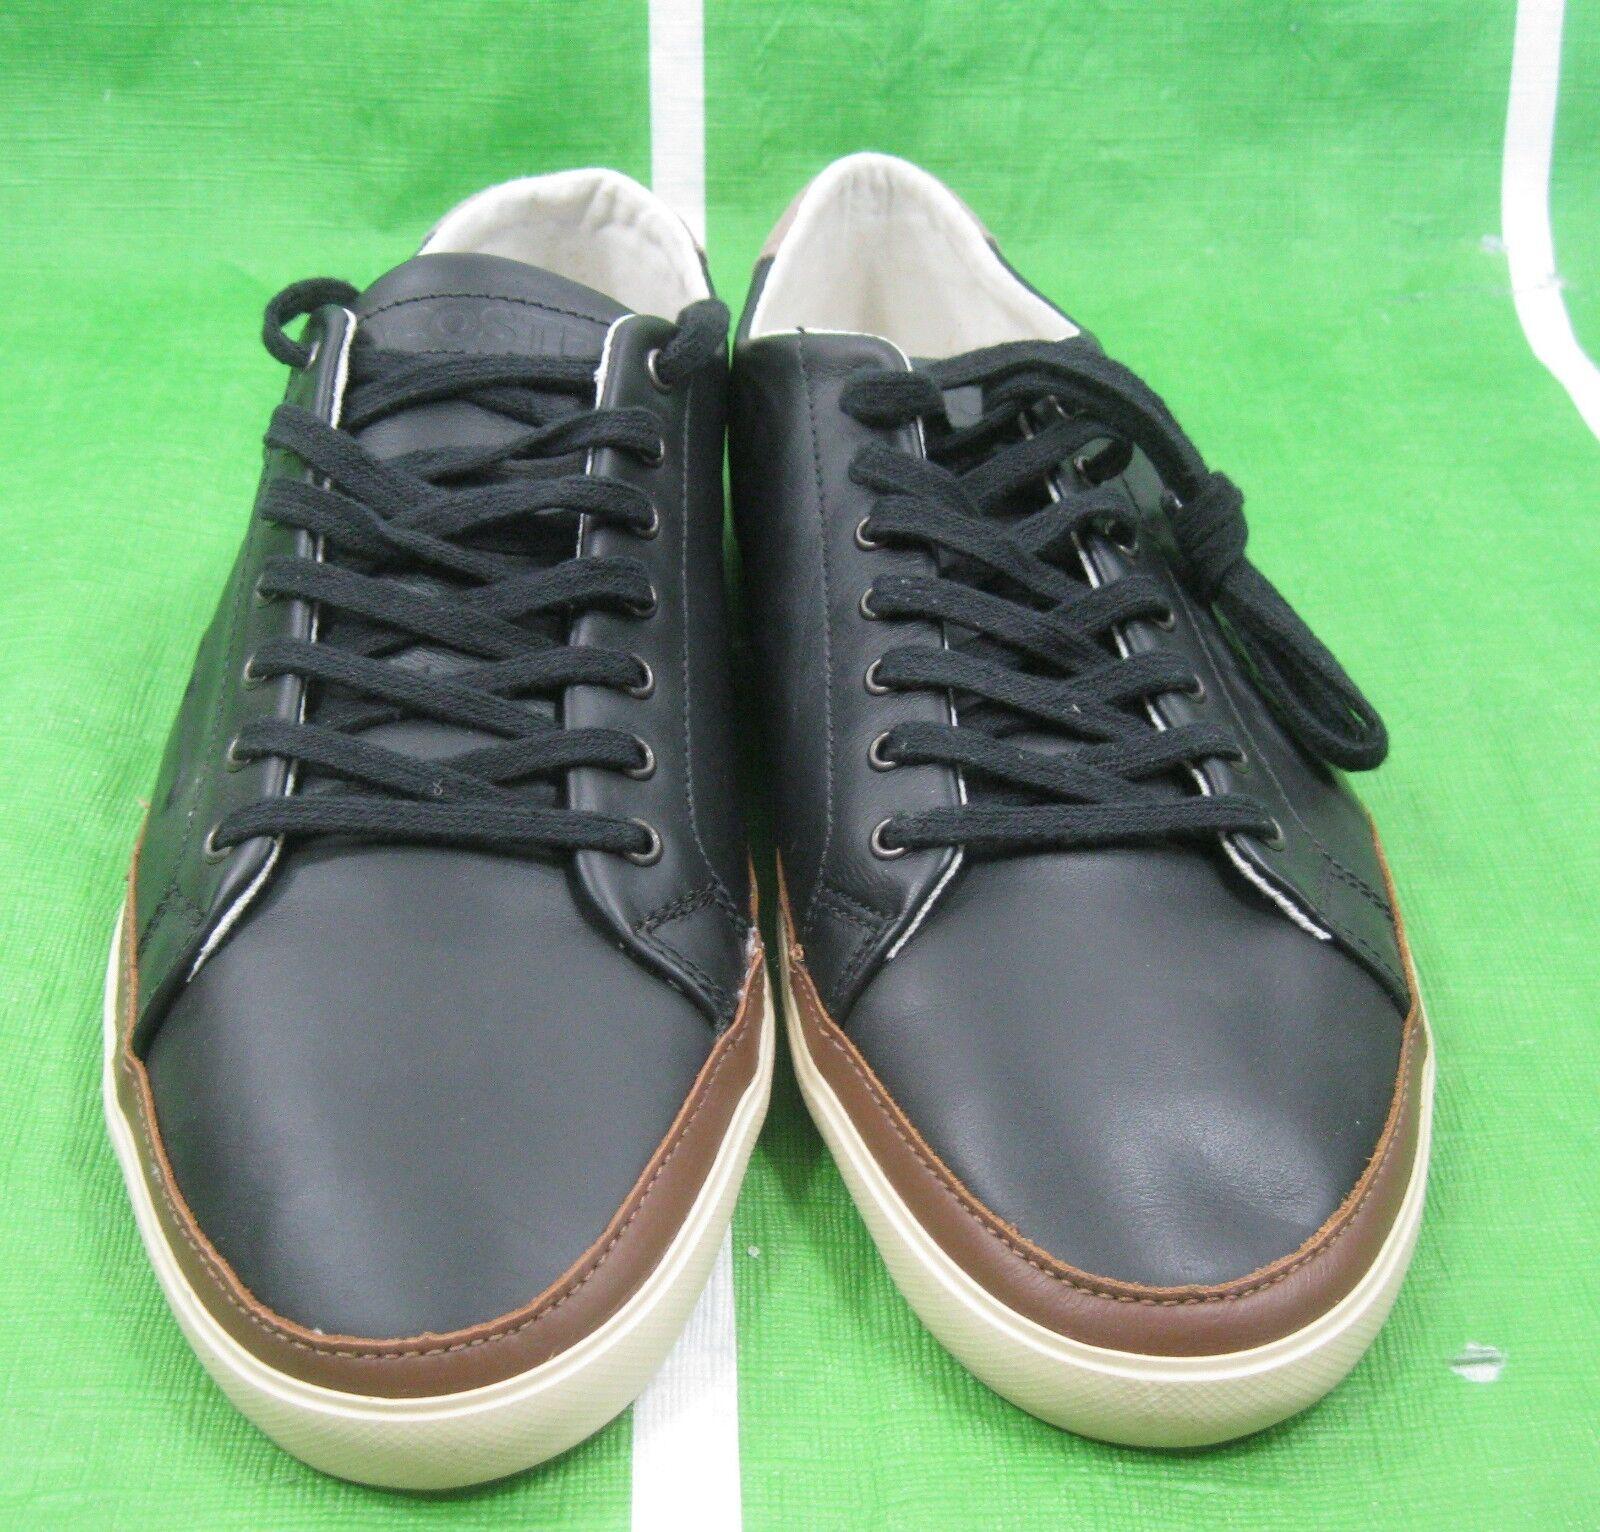 f27ff2fde6b ... Lacoste Bocana Bocana Bocana 6 SRM Leather Men s Shoes BLACK BONE  7-25srm22252 Size ...